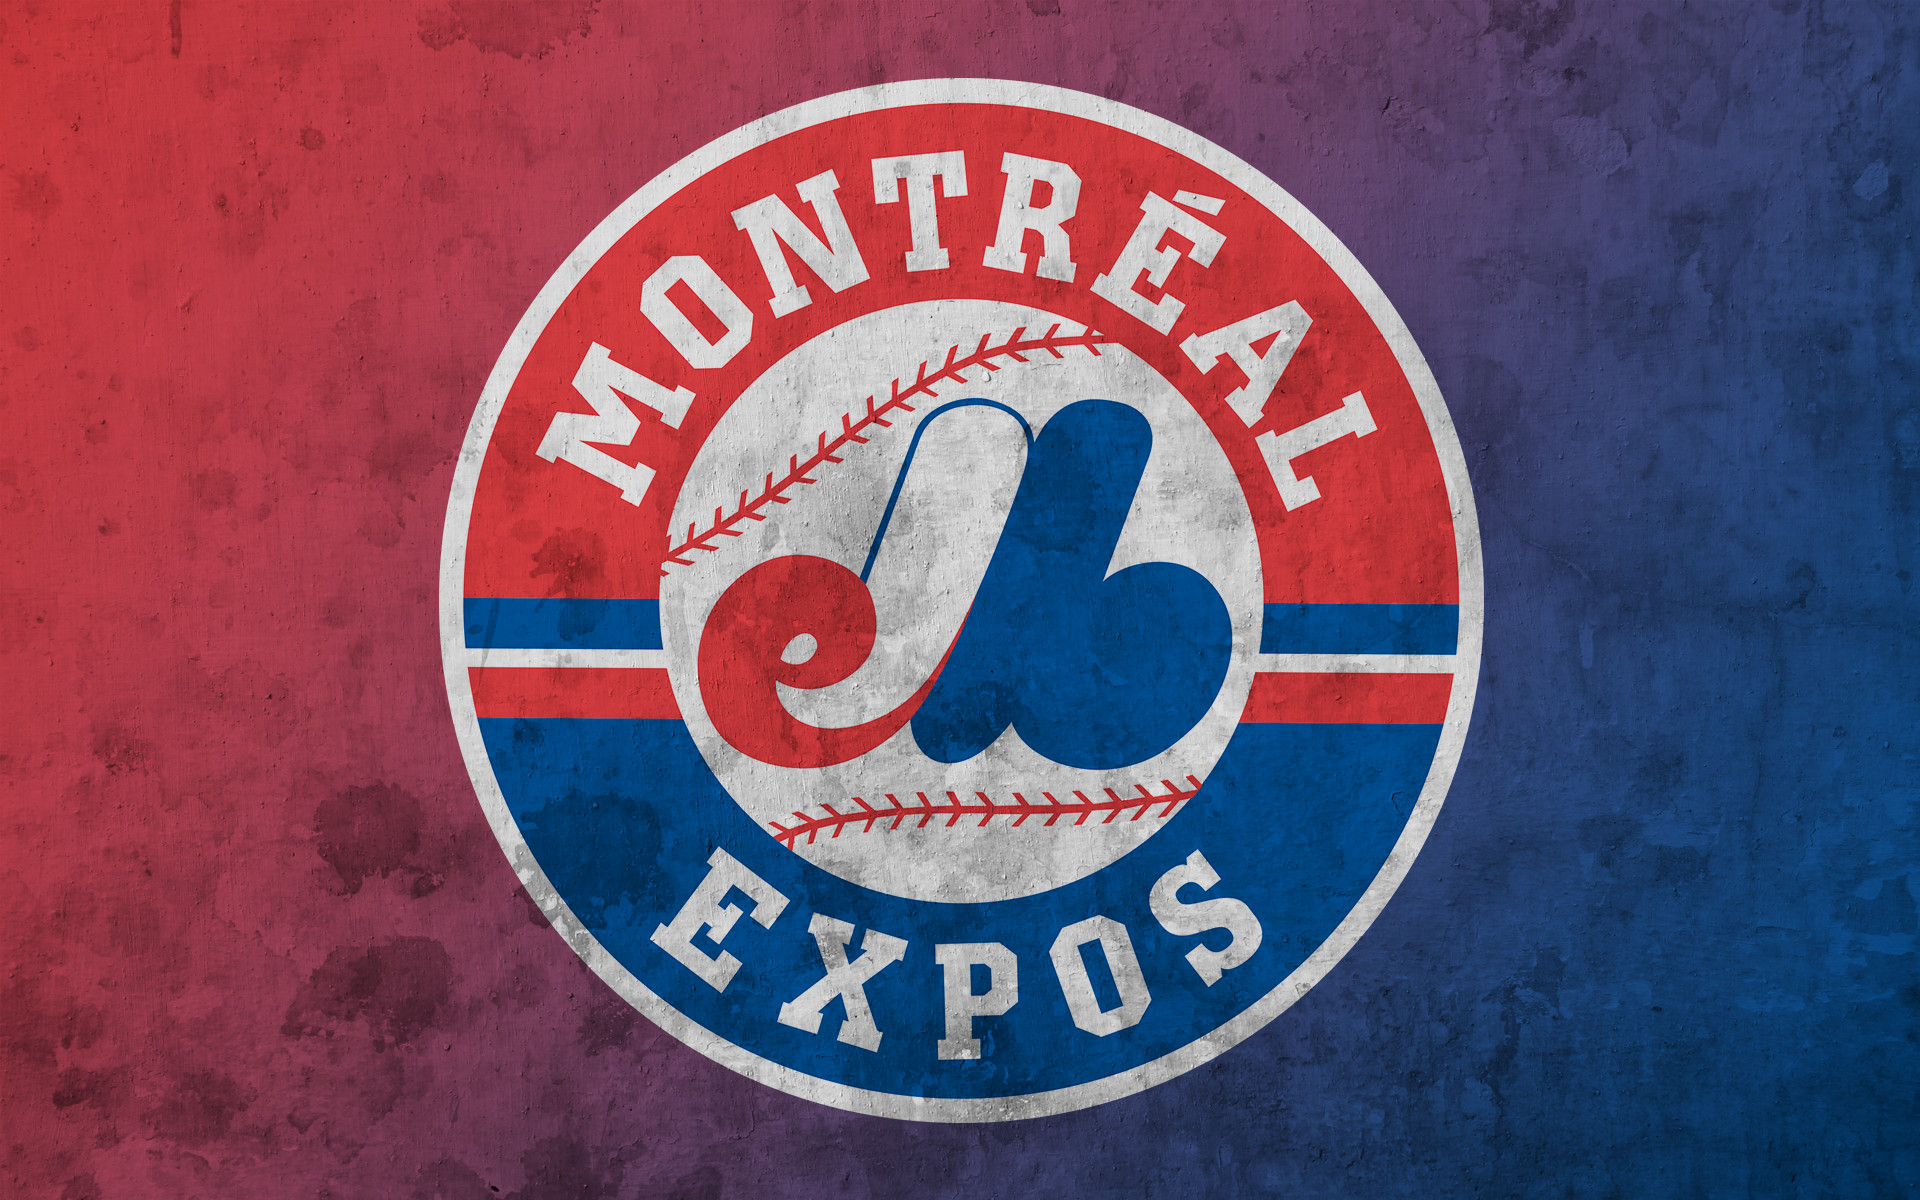 … Expos club logo …